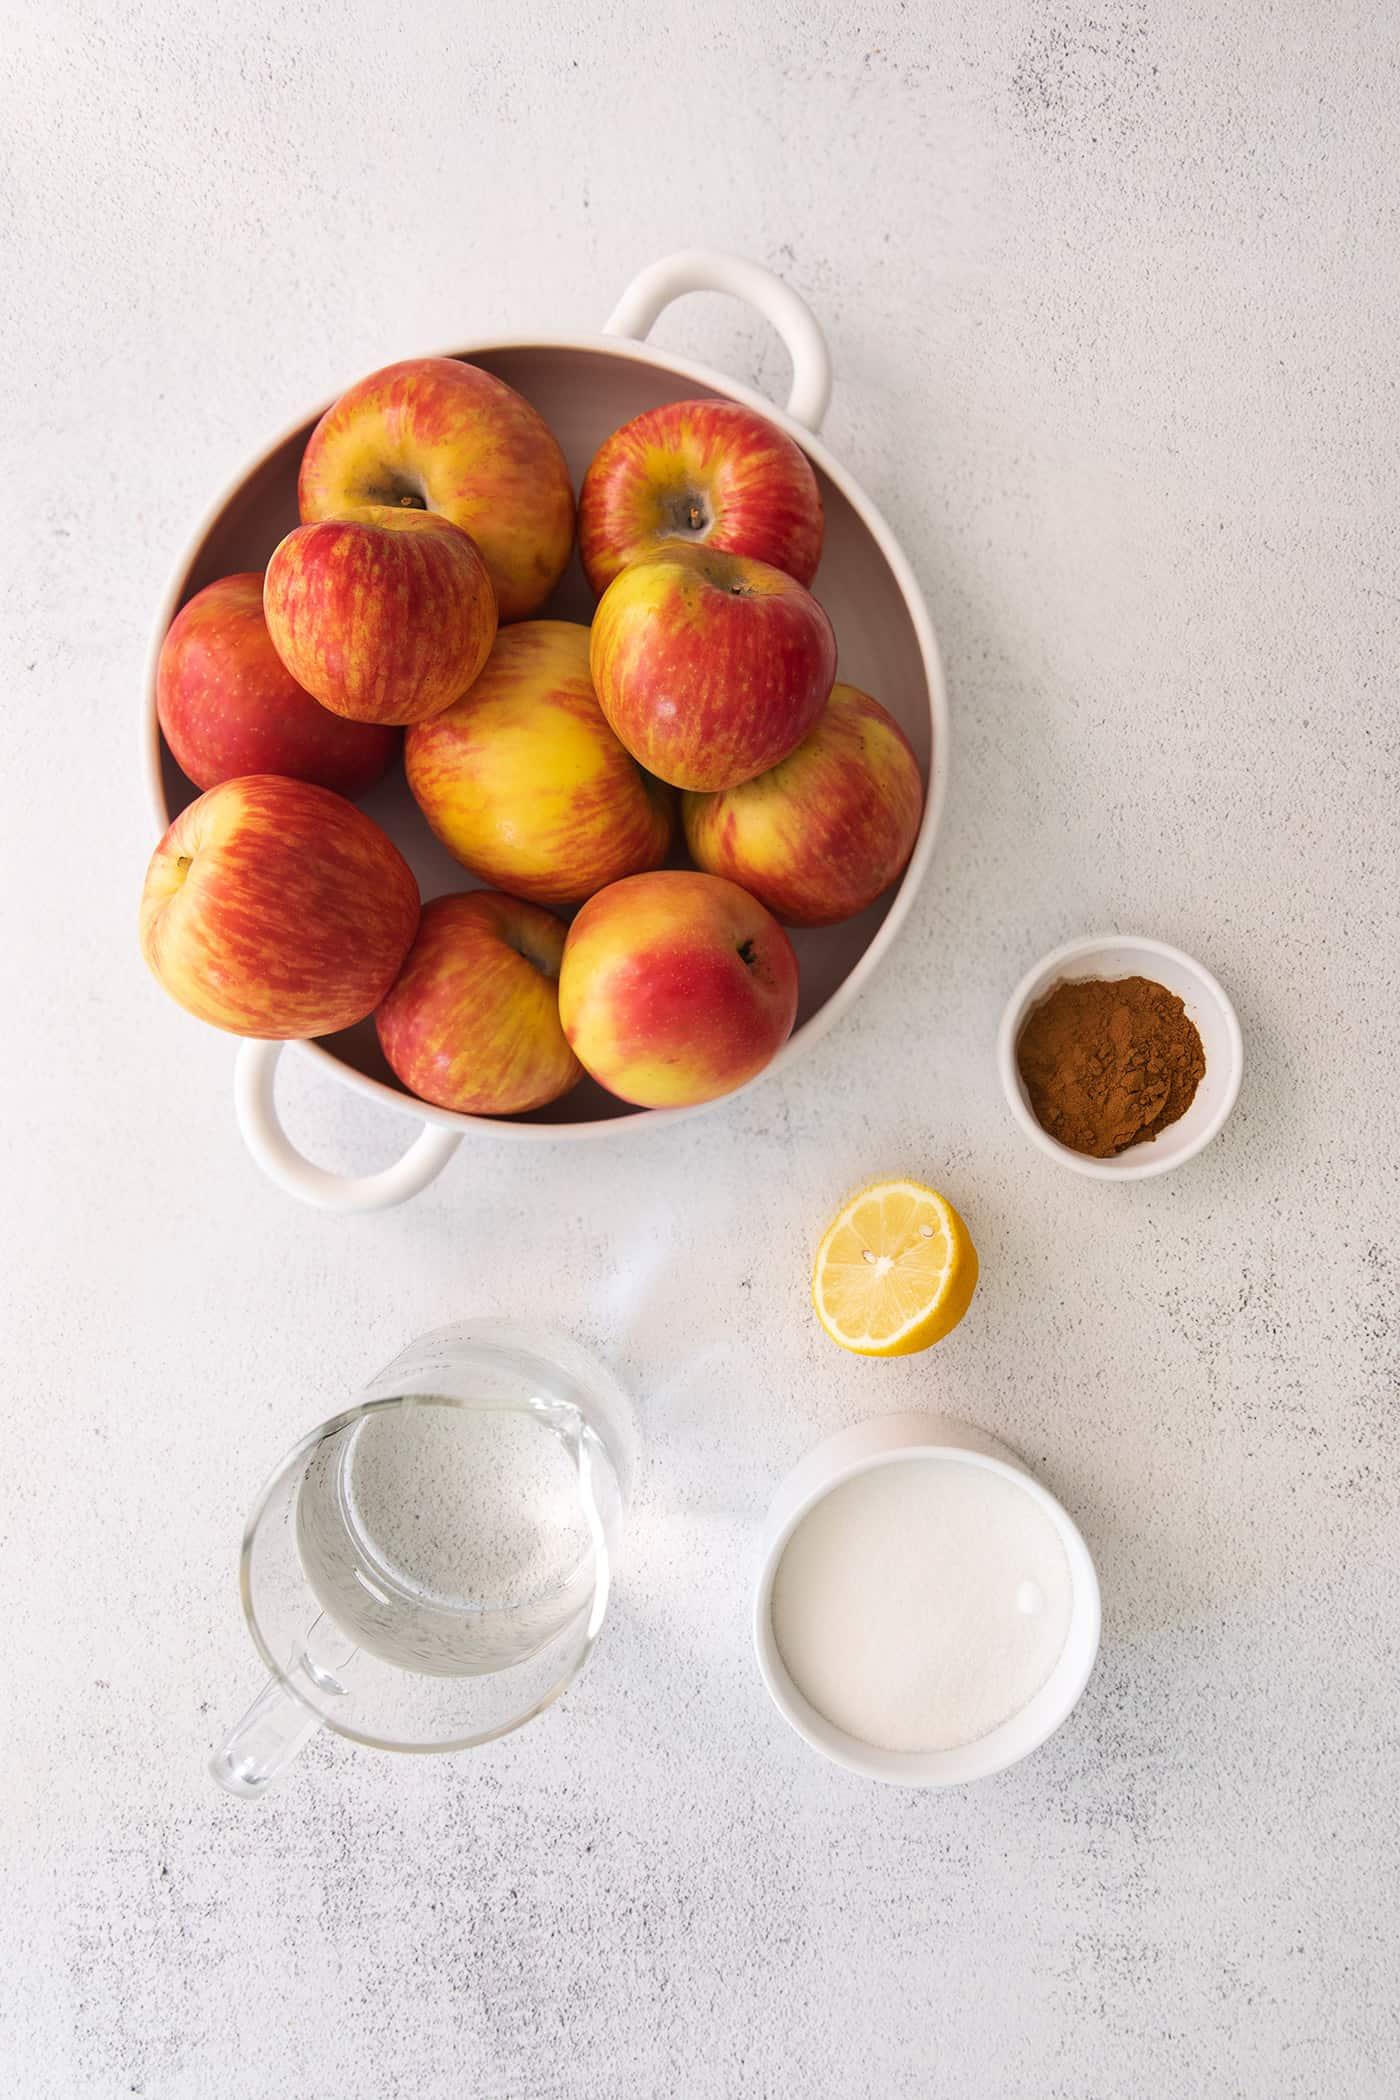 ingredients for homemade applesauce